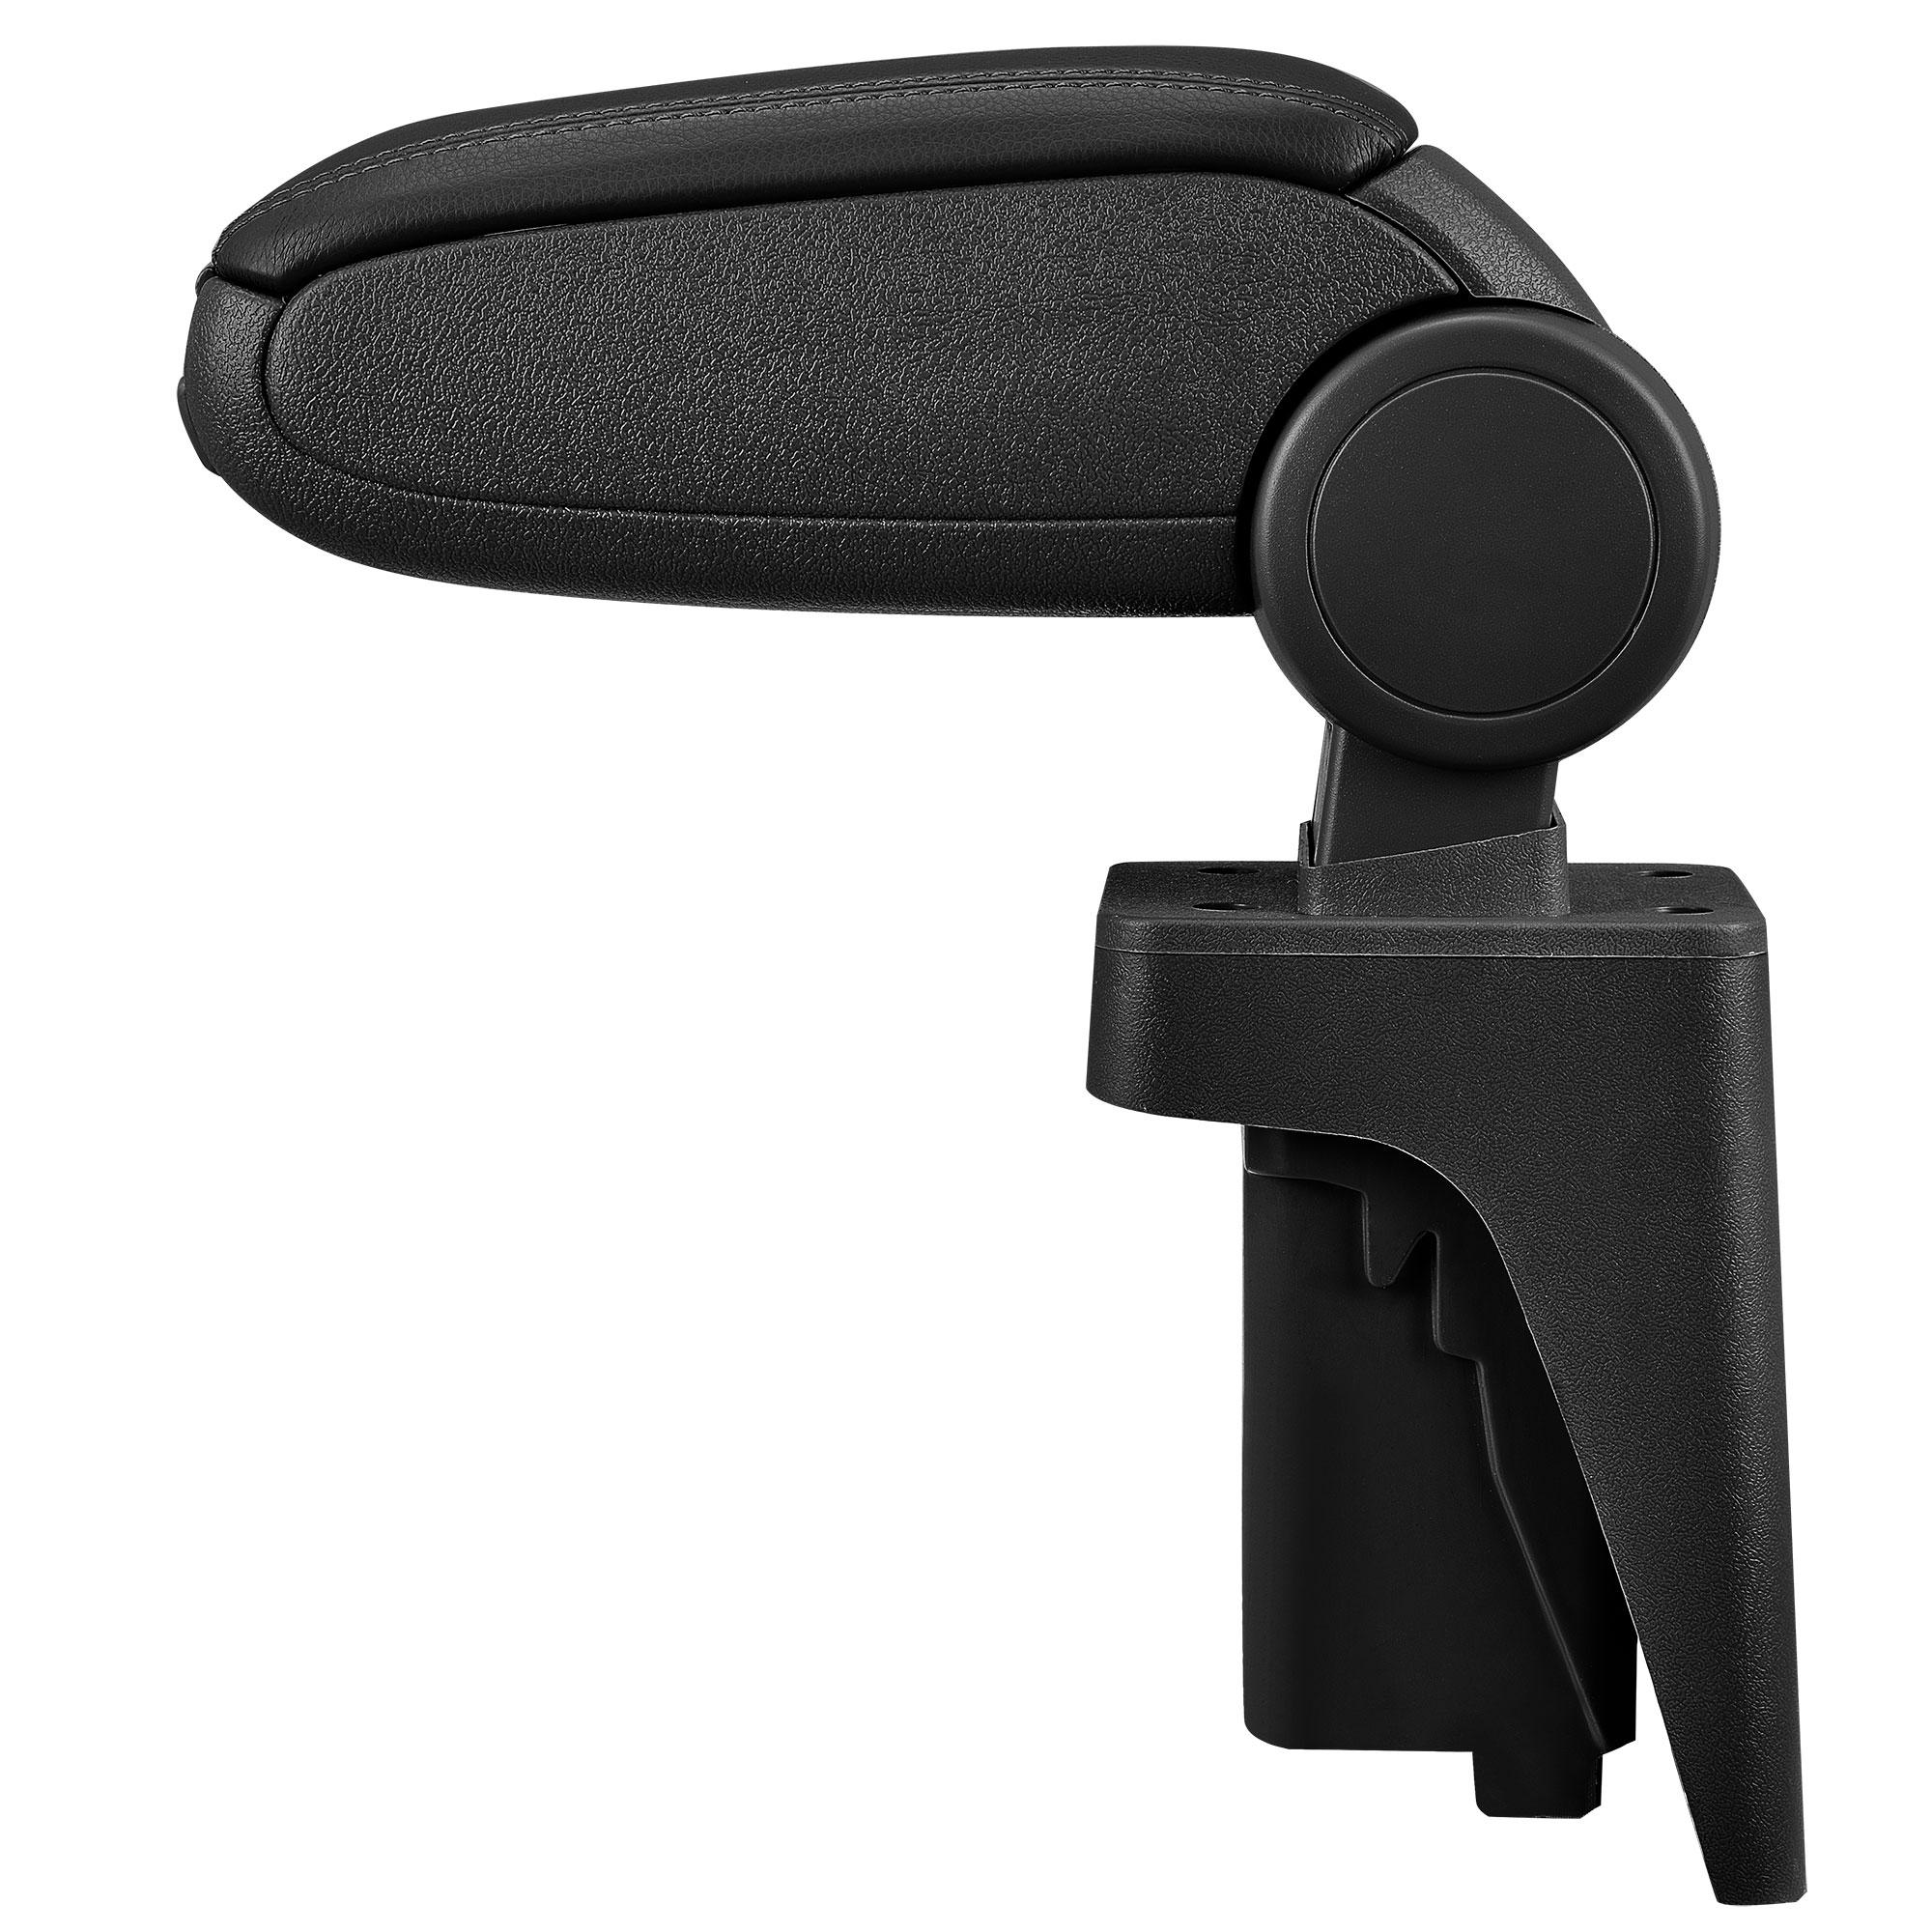 accoudoir central audi a3 s3 8p sportback cabriolet 2003 2012 cuir noir neuf ebay. Black Bedroom Furniture Sets. Home Design Ideas